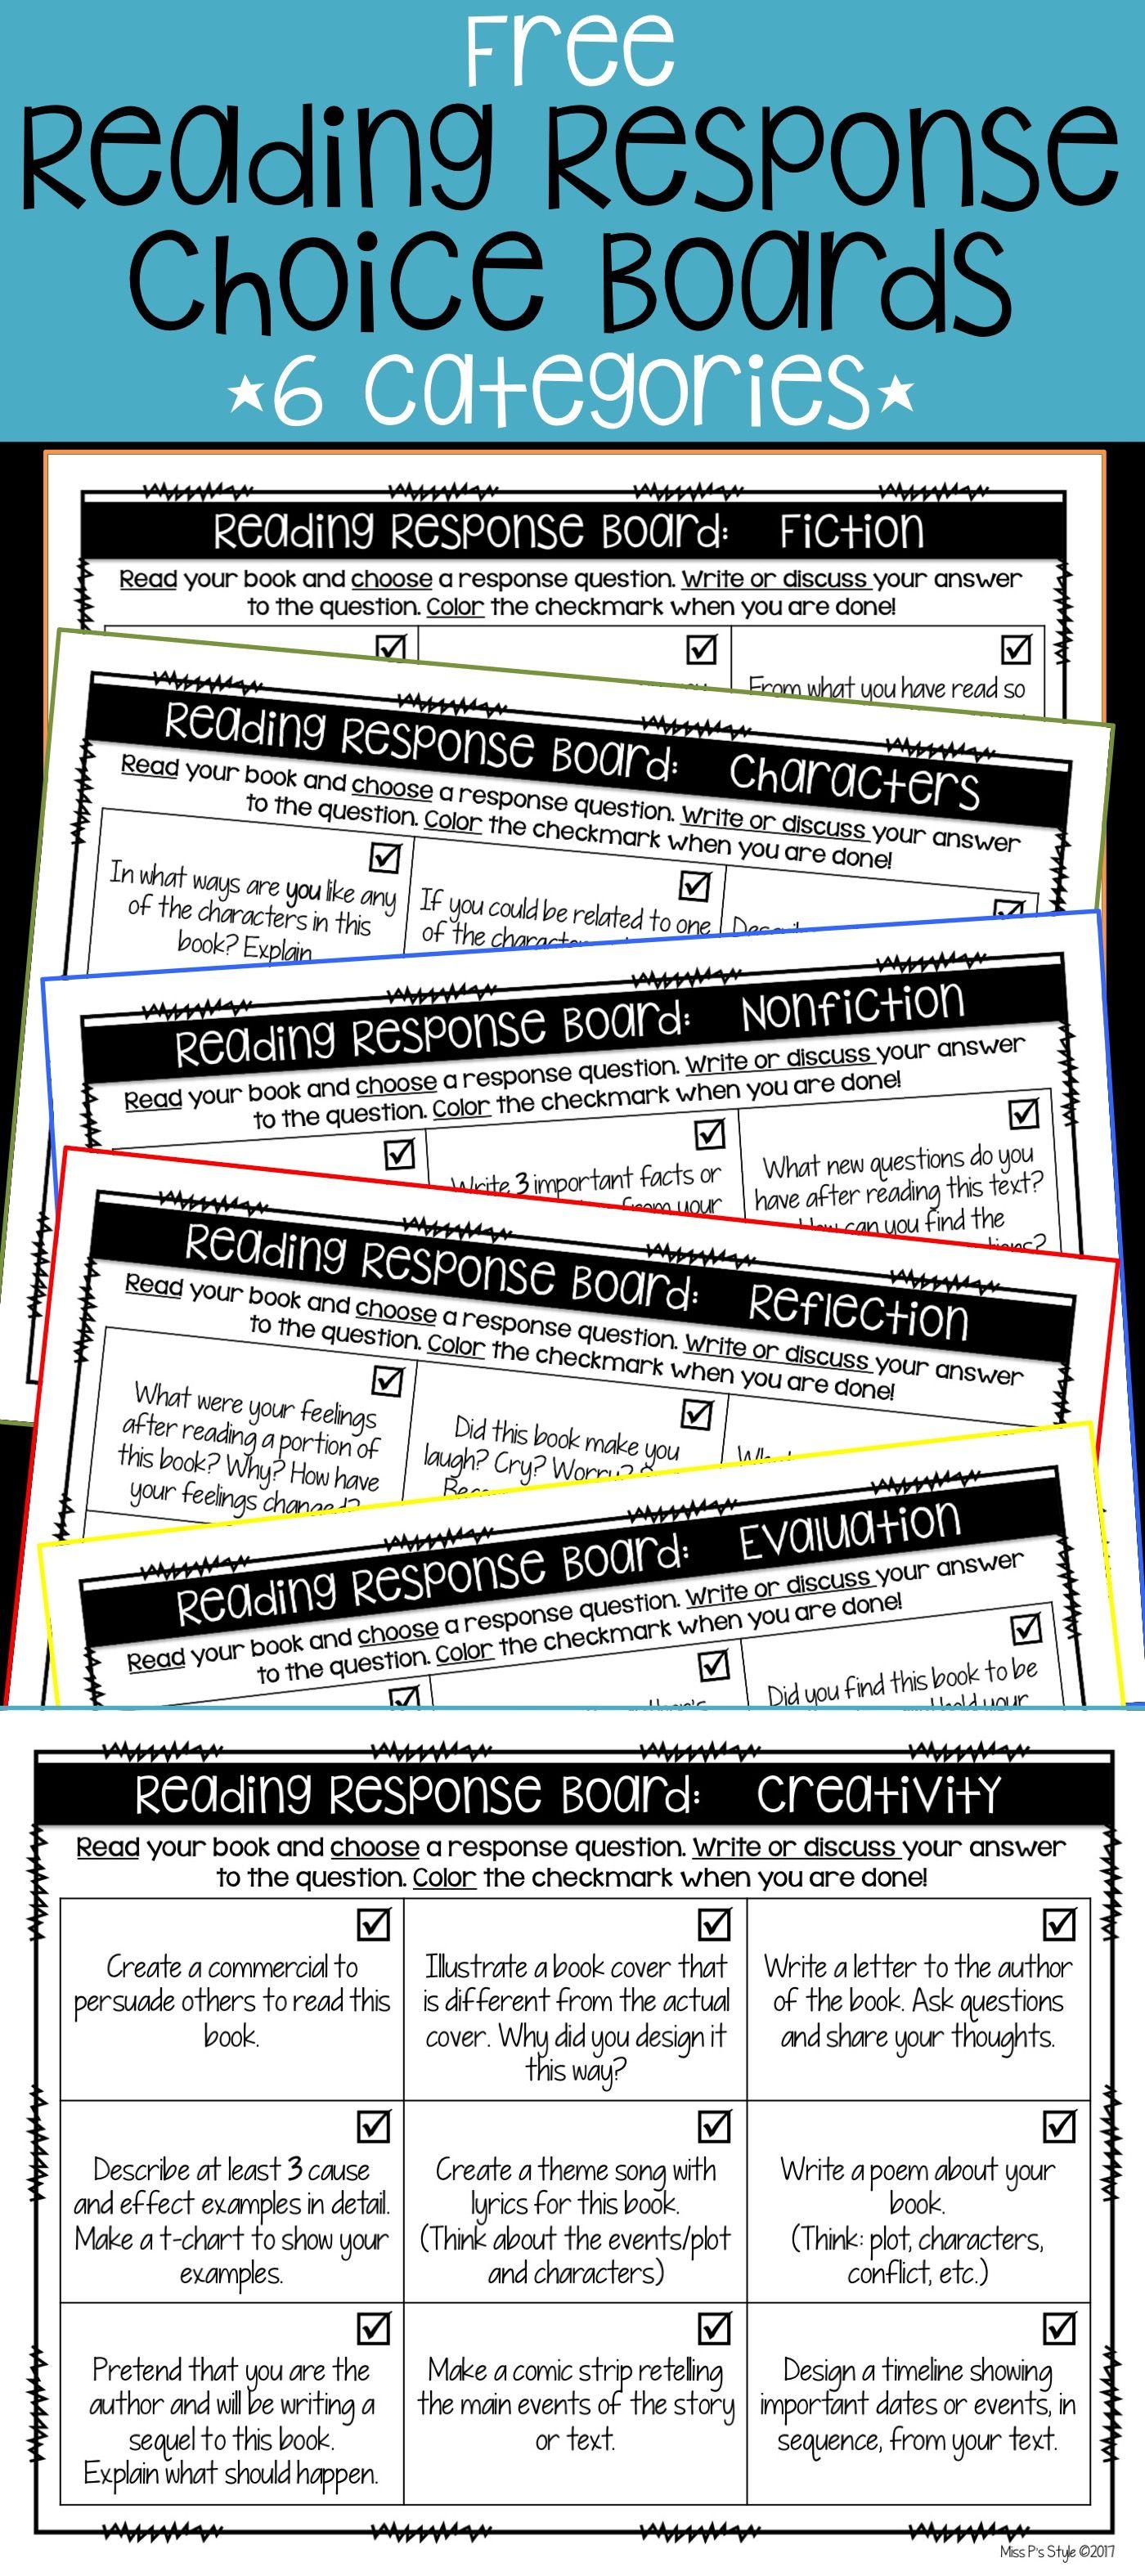 6 Free Reading Response Choice Boards